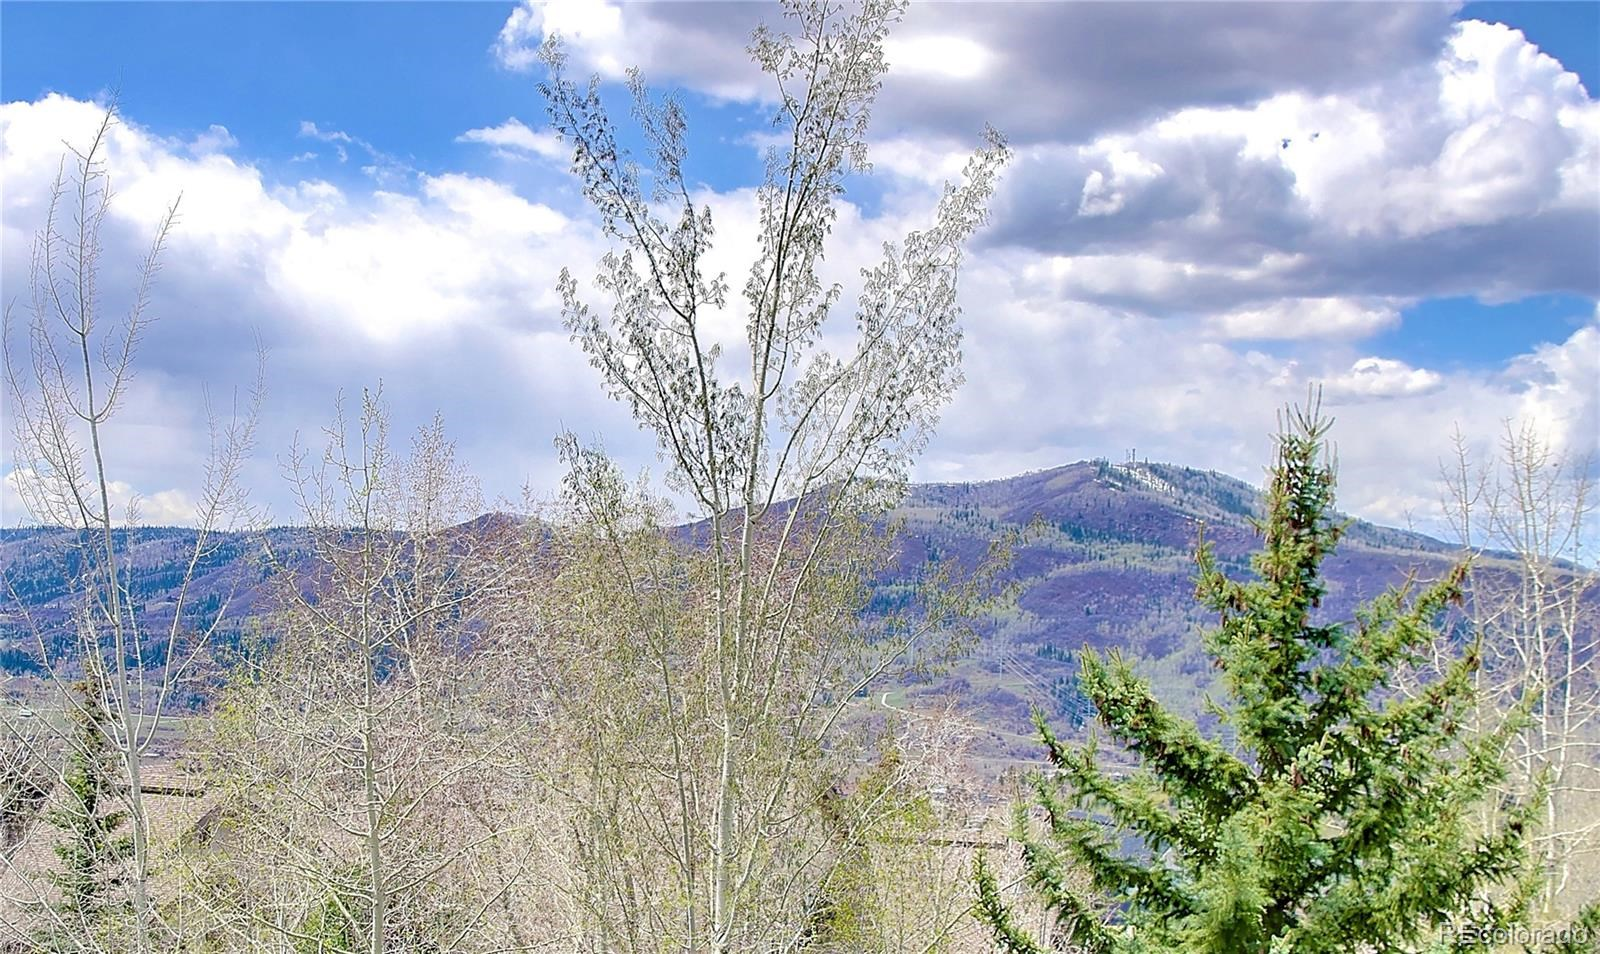 MLS# 2309963 - 13 - 1145 Overlook Drive #C1, Steamboat Springs, CO 80487